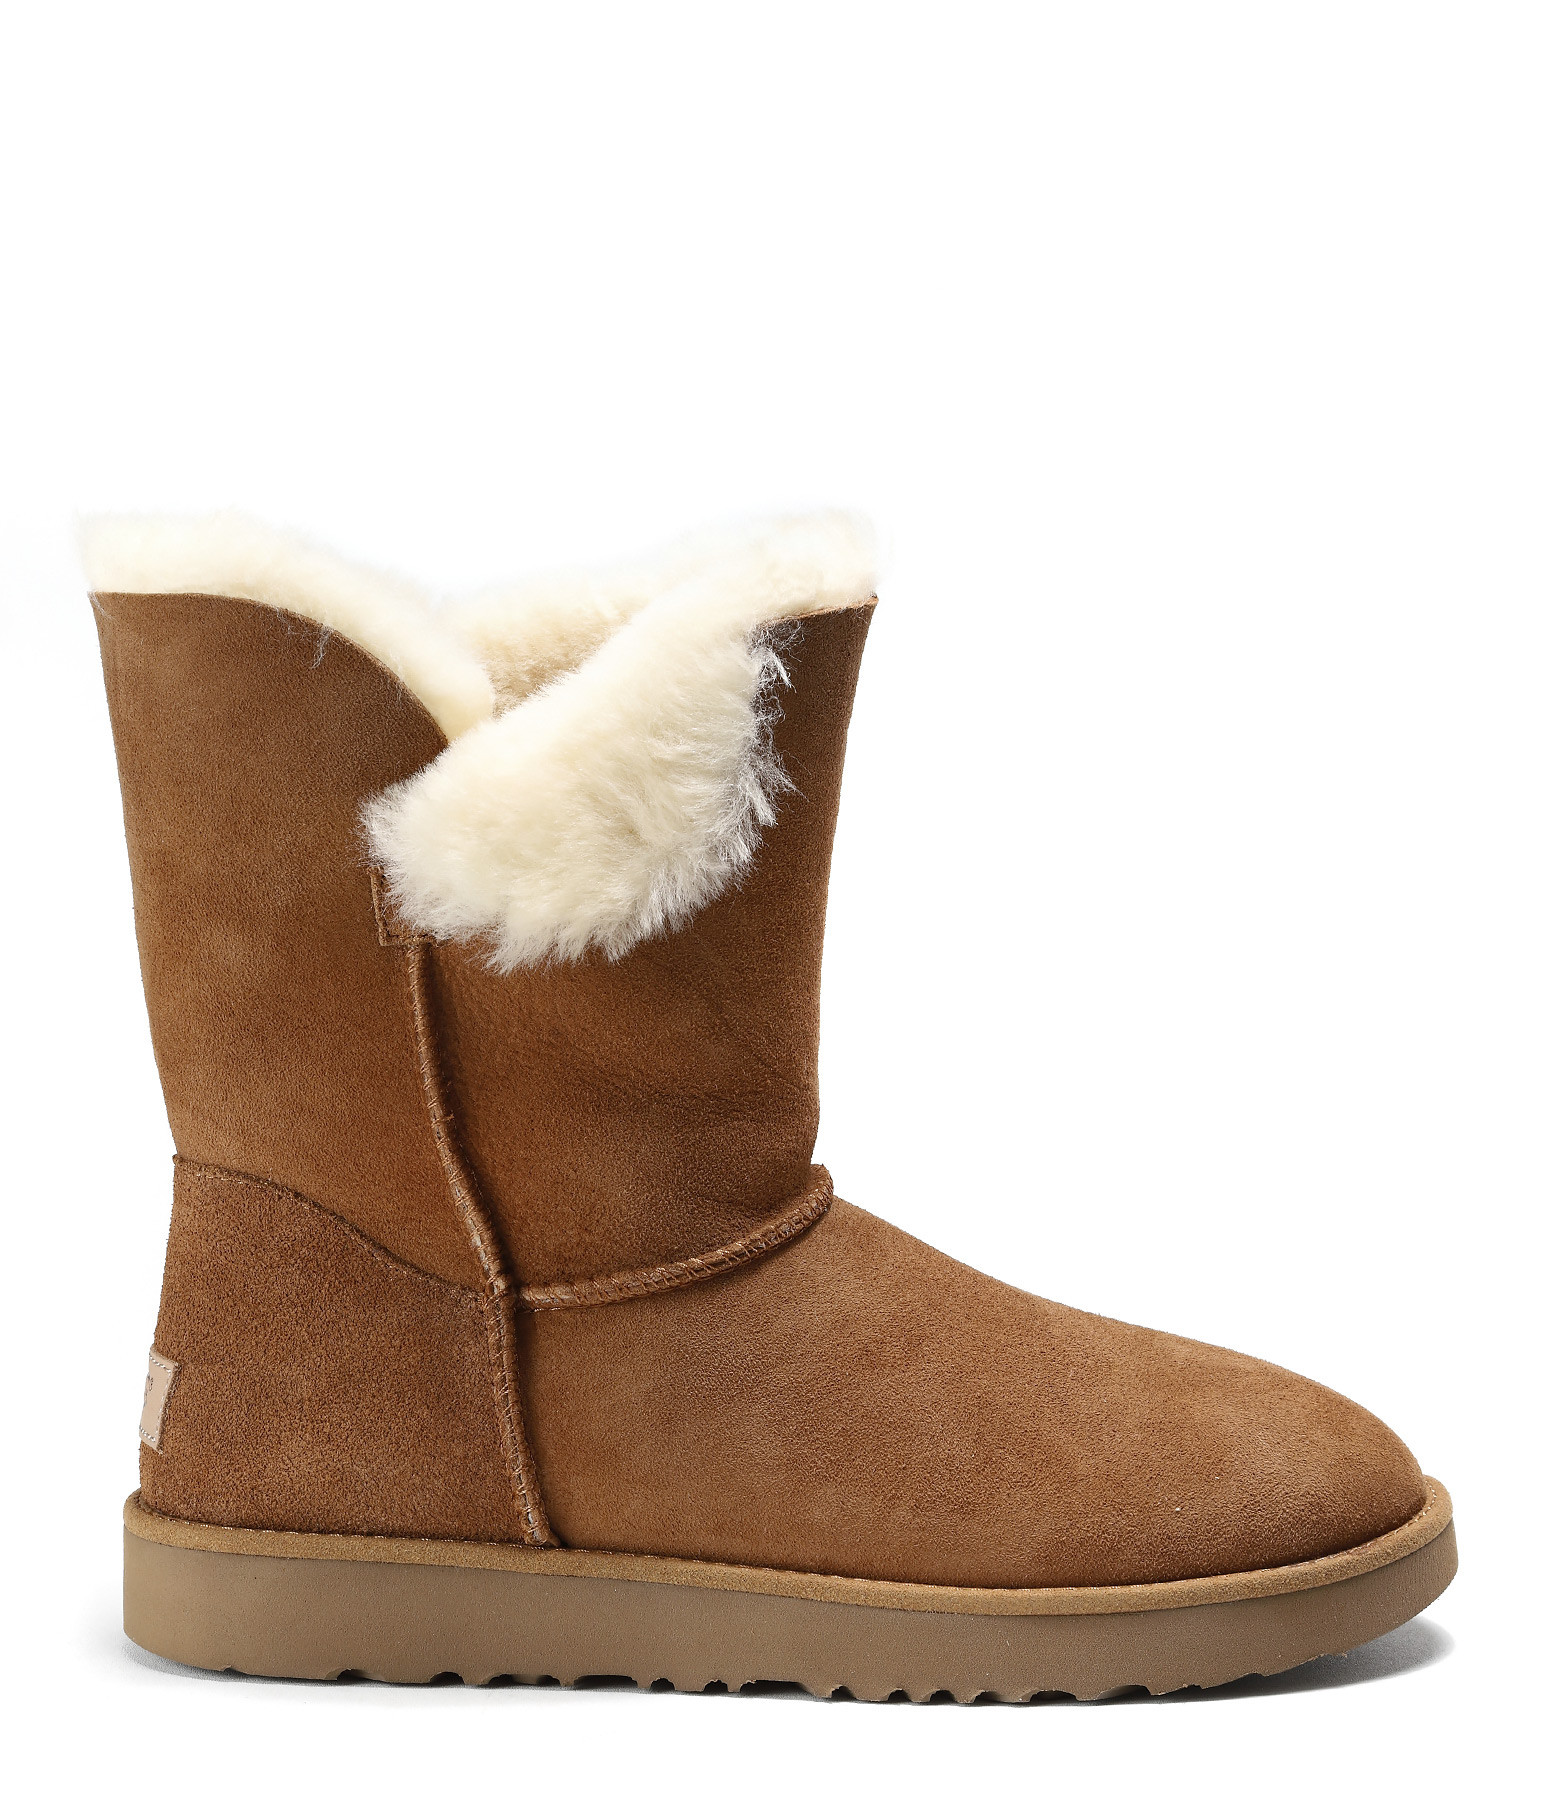 UGG - Boots Classic Cuff Short Chesnut